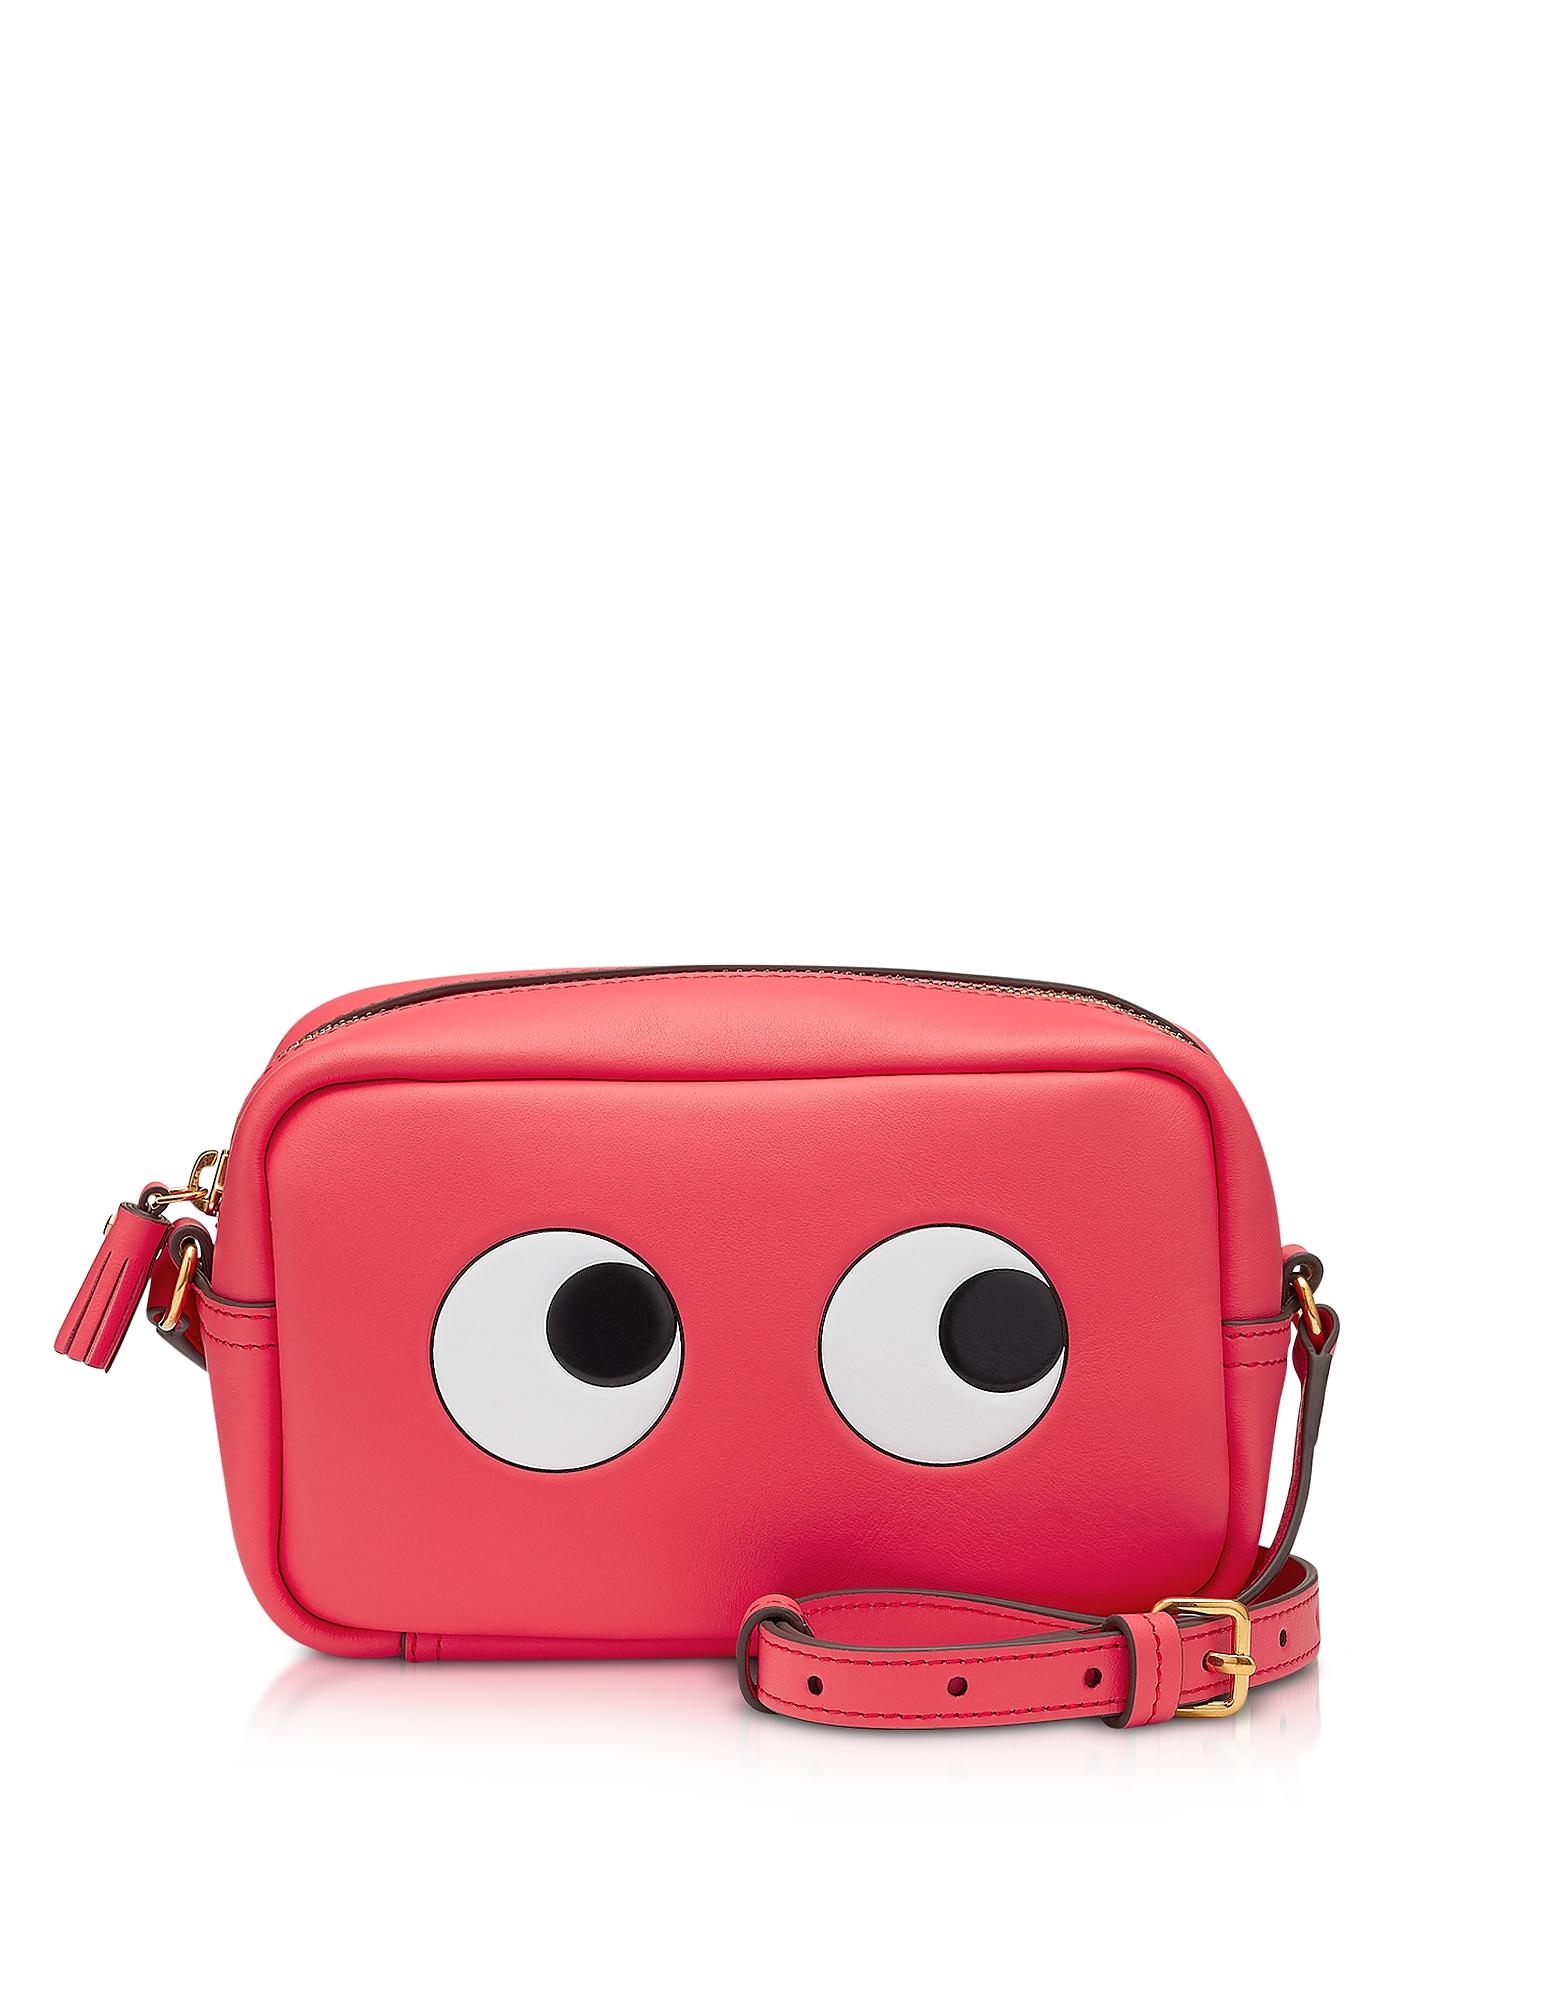 Circus Leather Mini Eyes Cross-Body Bag